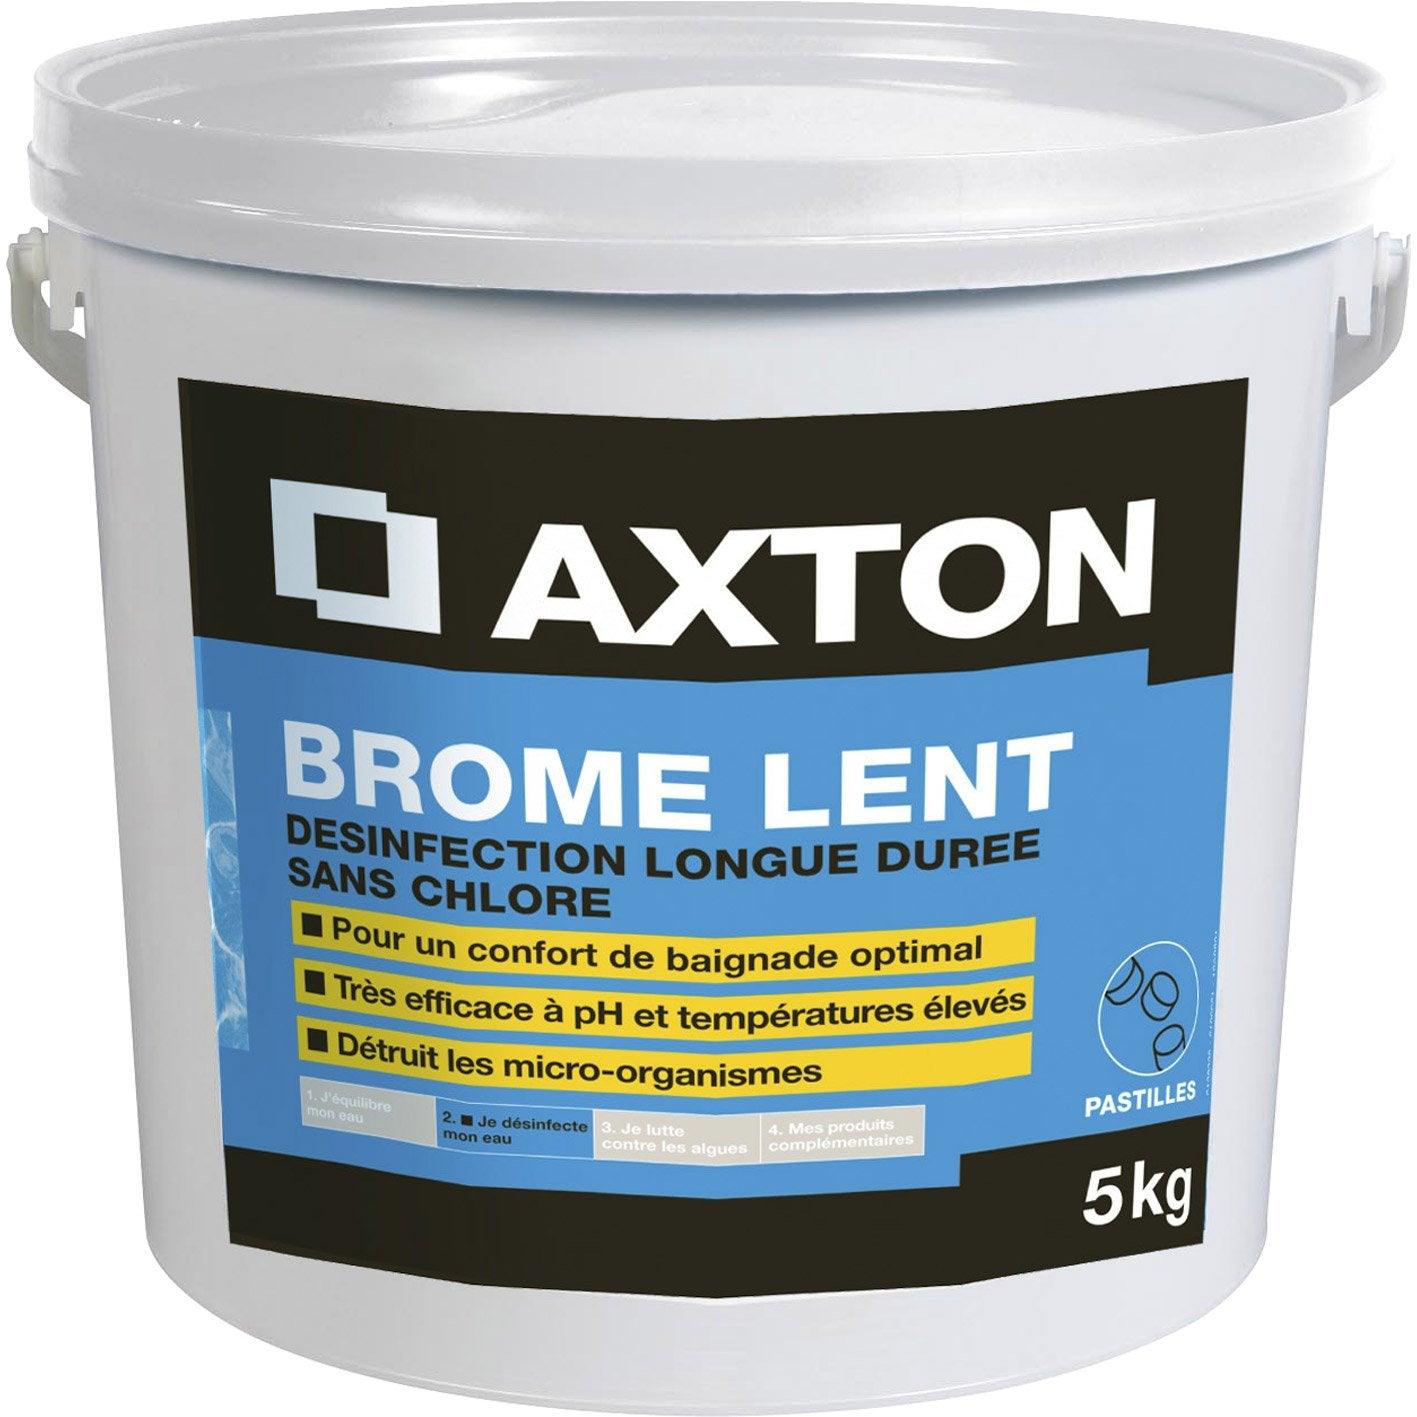 brome lent pour piscine axton 5 kg leroy merlin. Black Bedroom Furniture Sets. Home Design Ideas